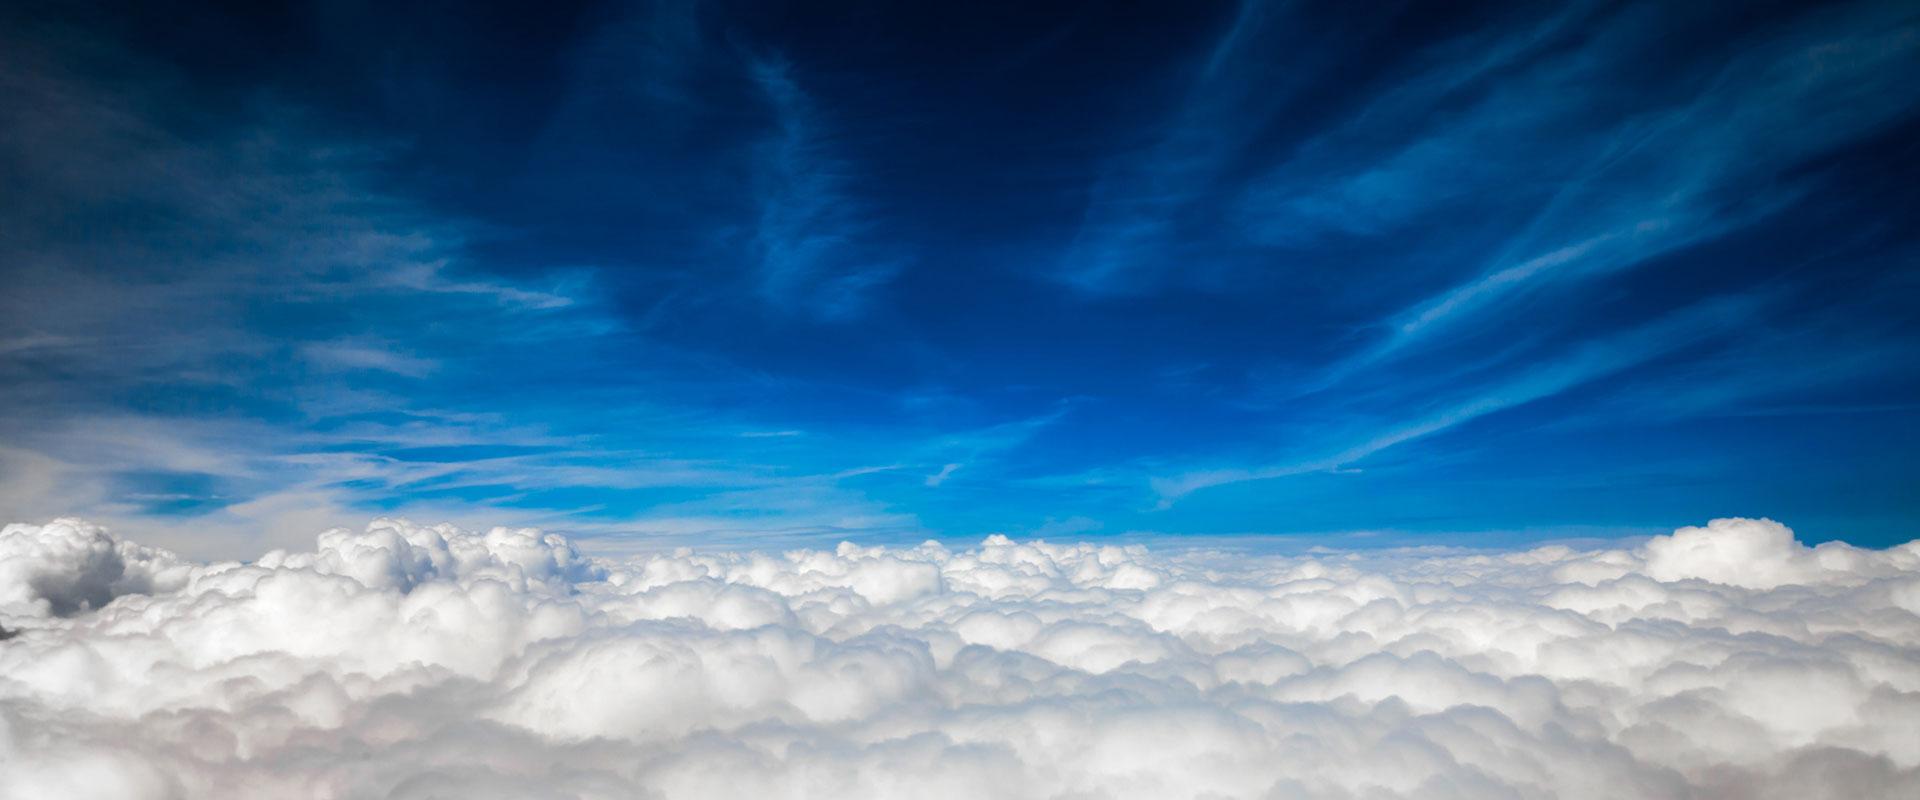 _showcase_clouds.jpg - 121.44 kB